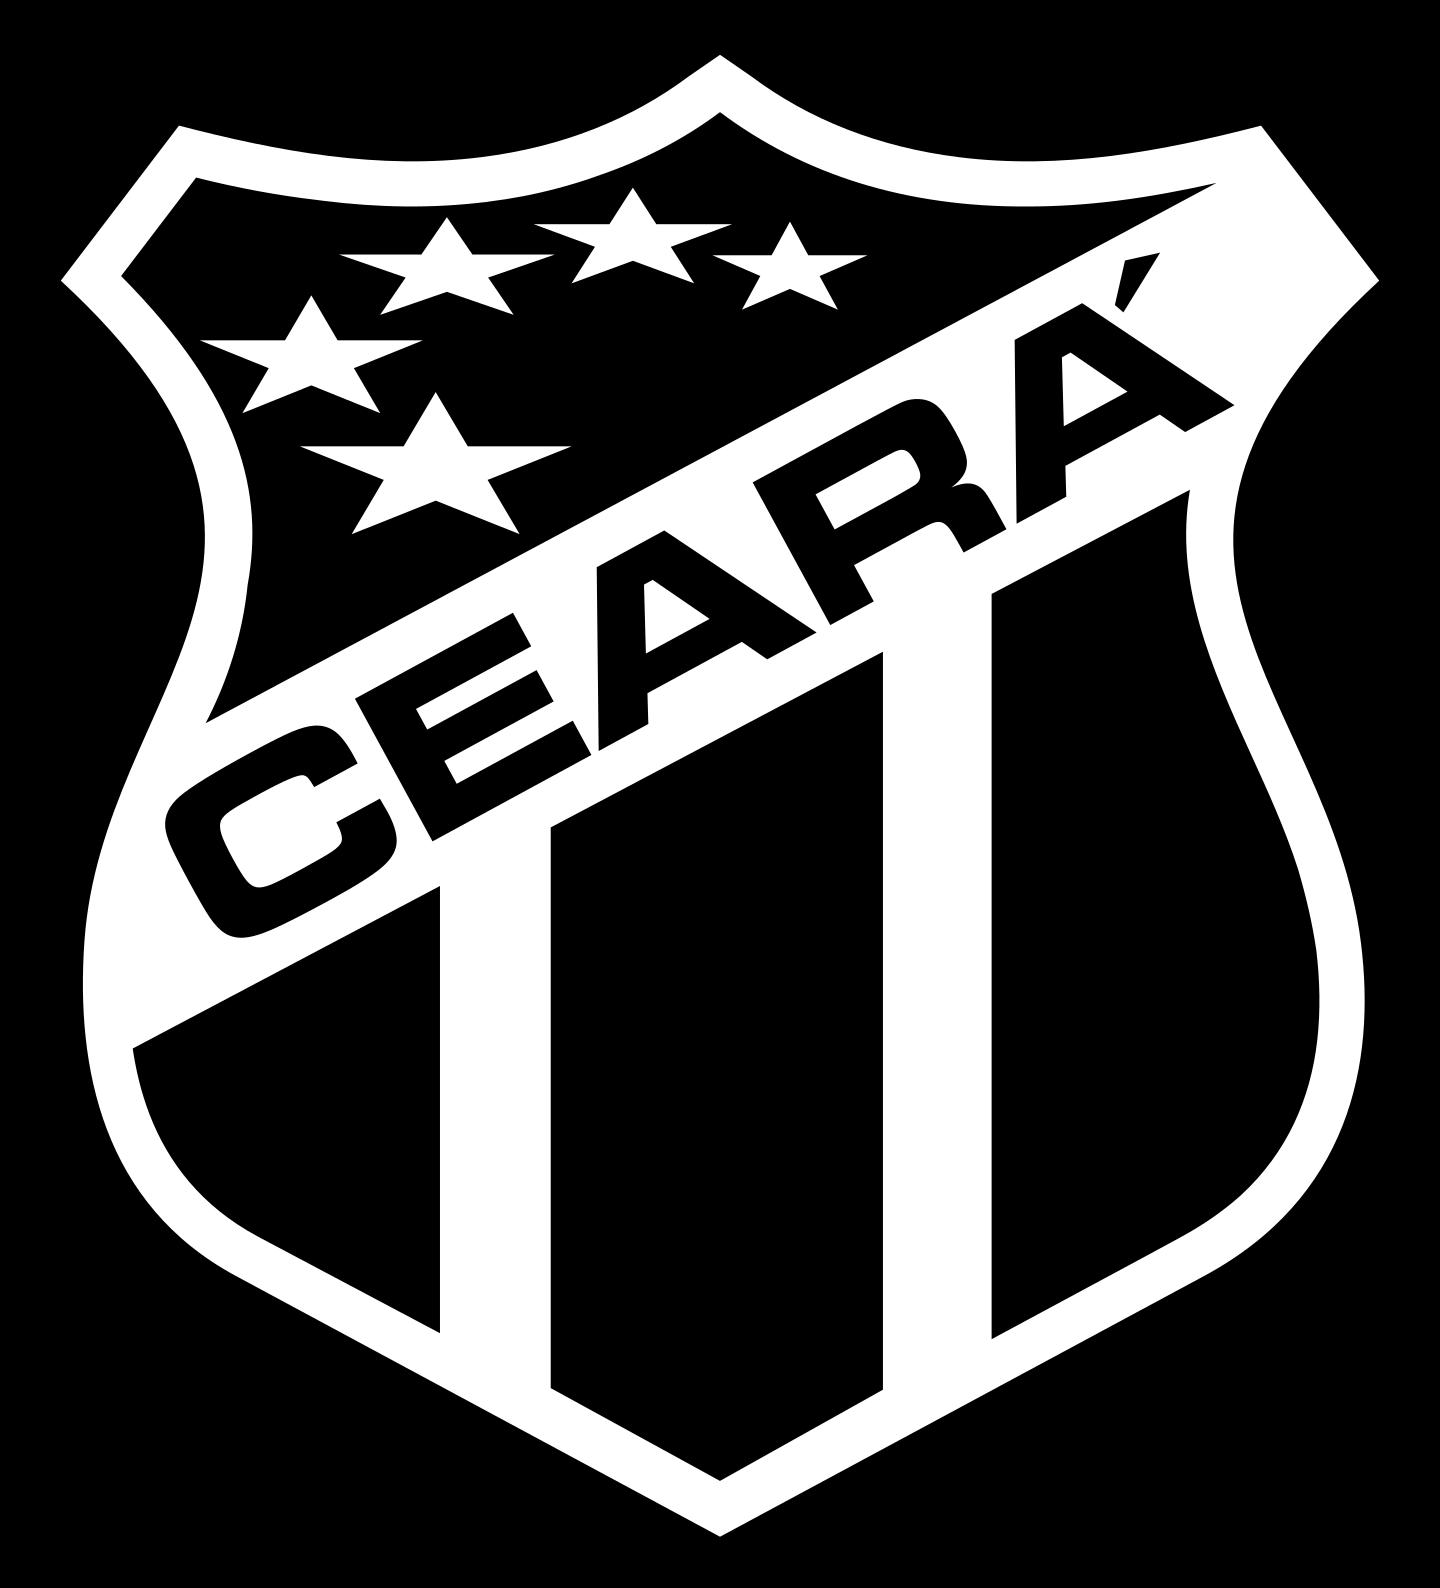 ceara logo 2 - Ceará SC Logo